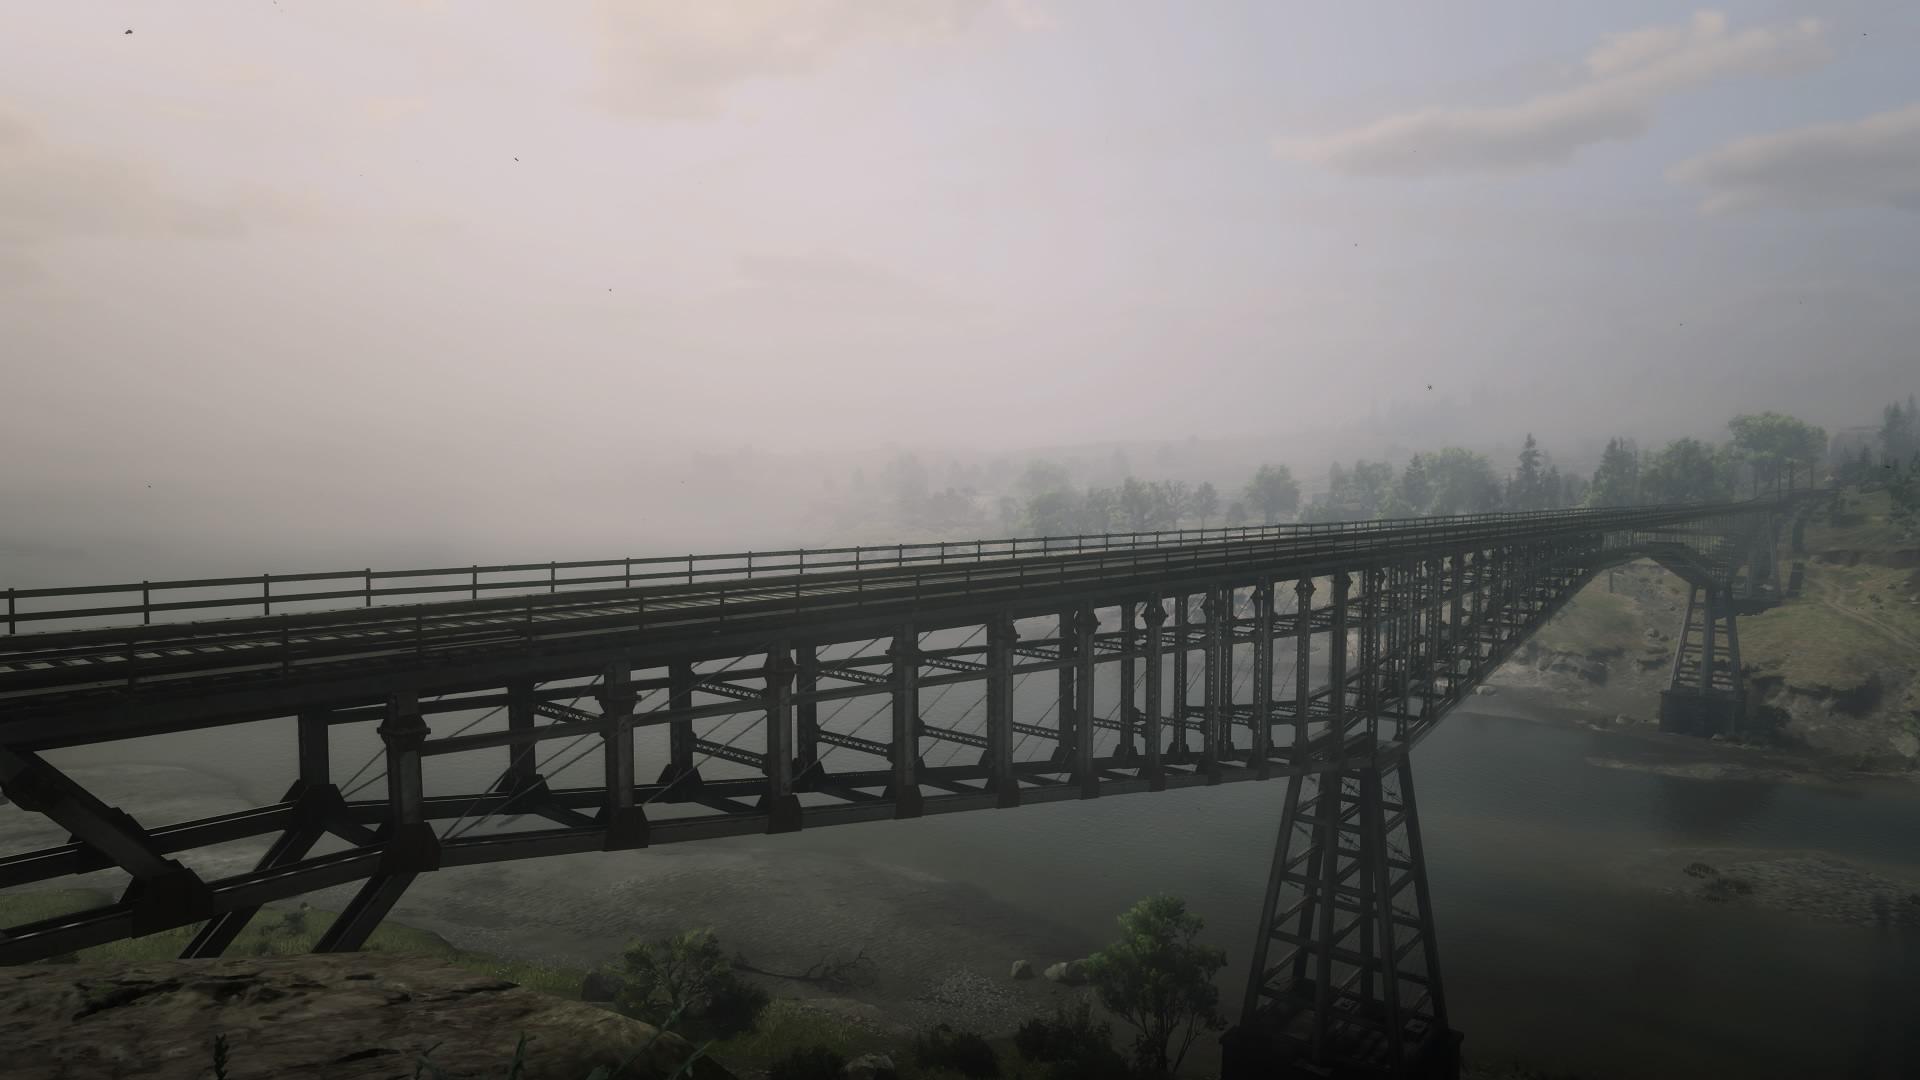 Bard's Crossing